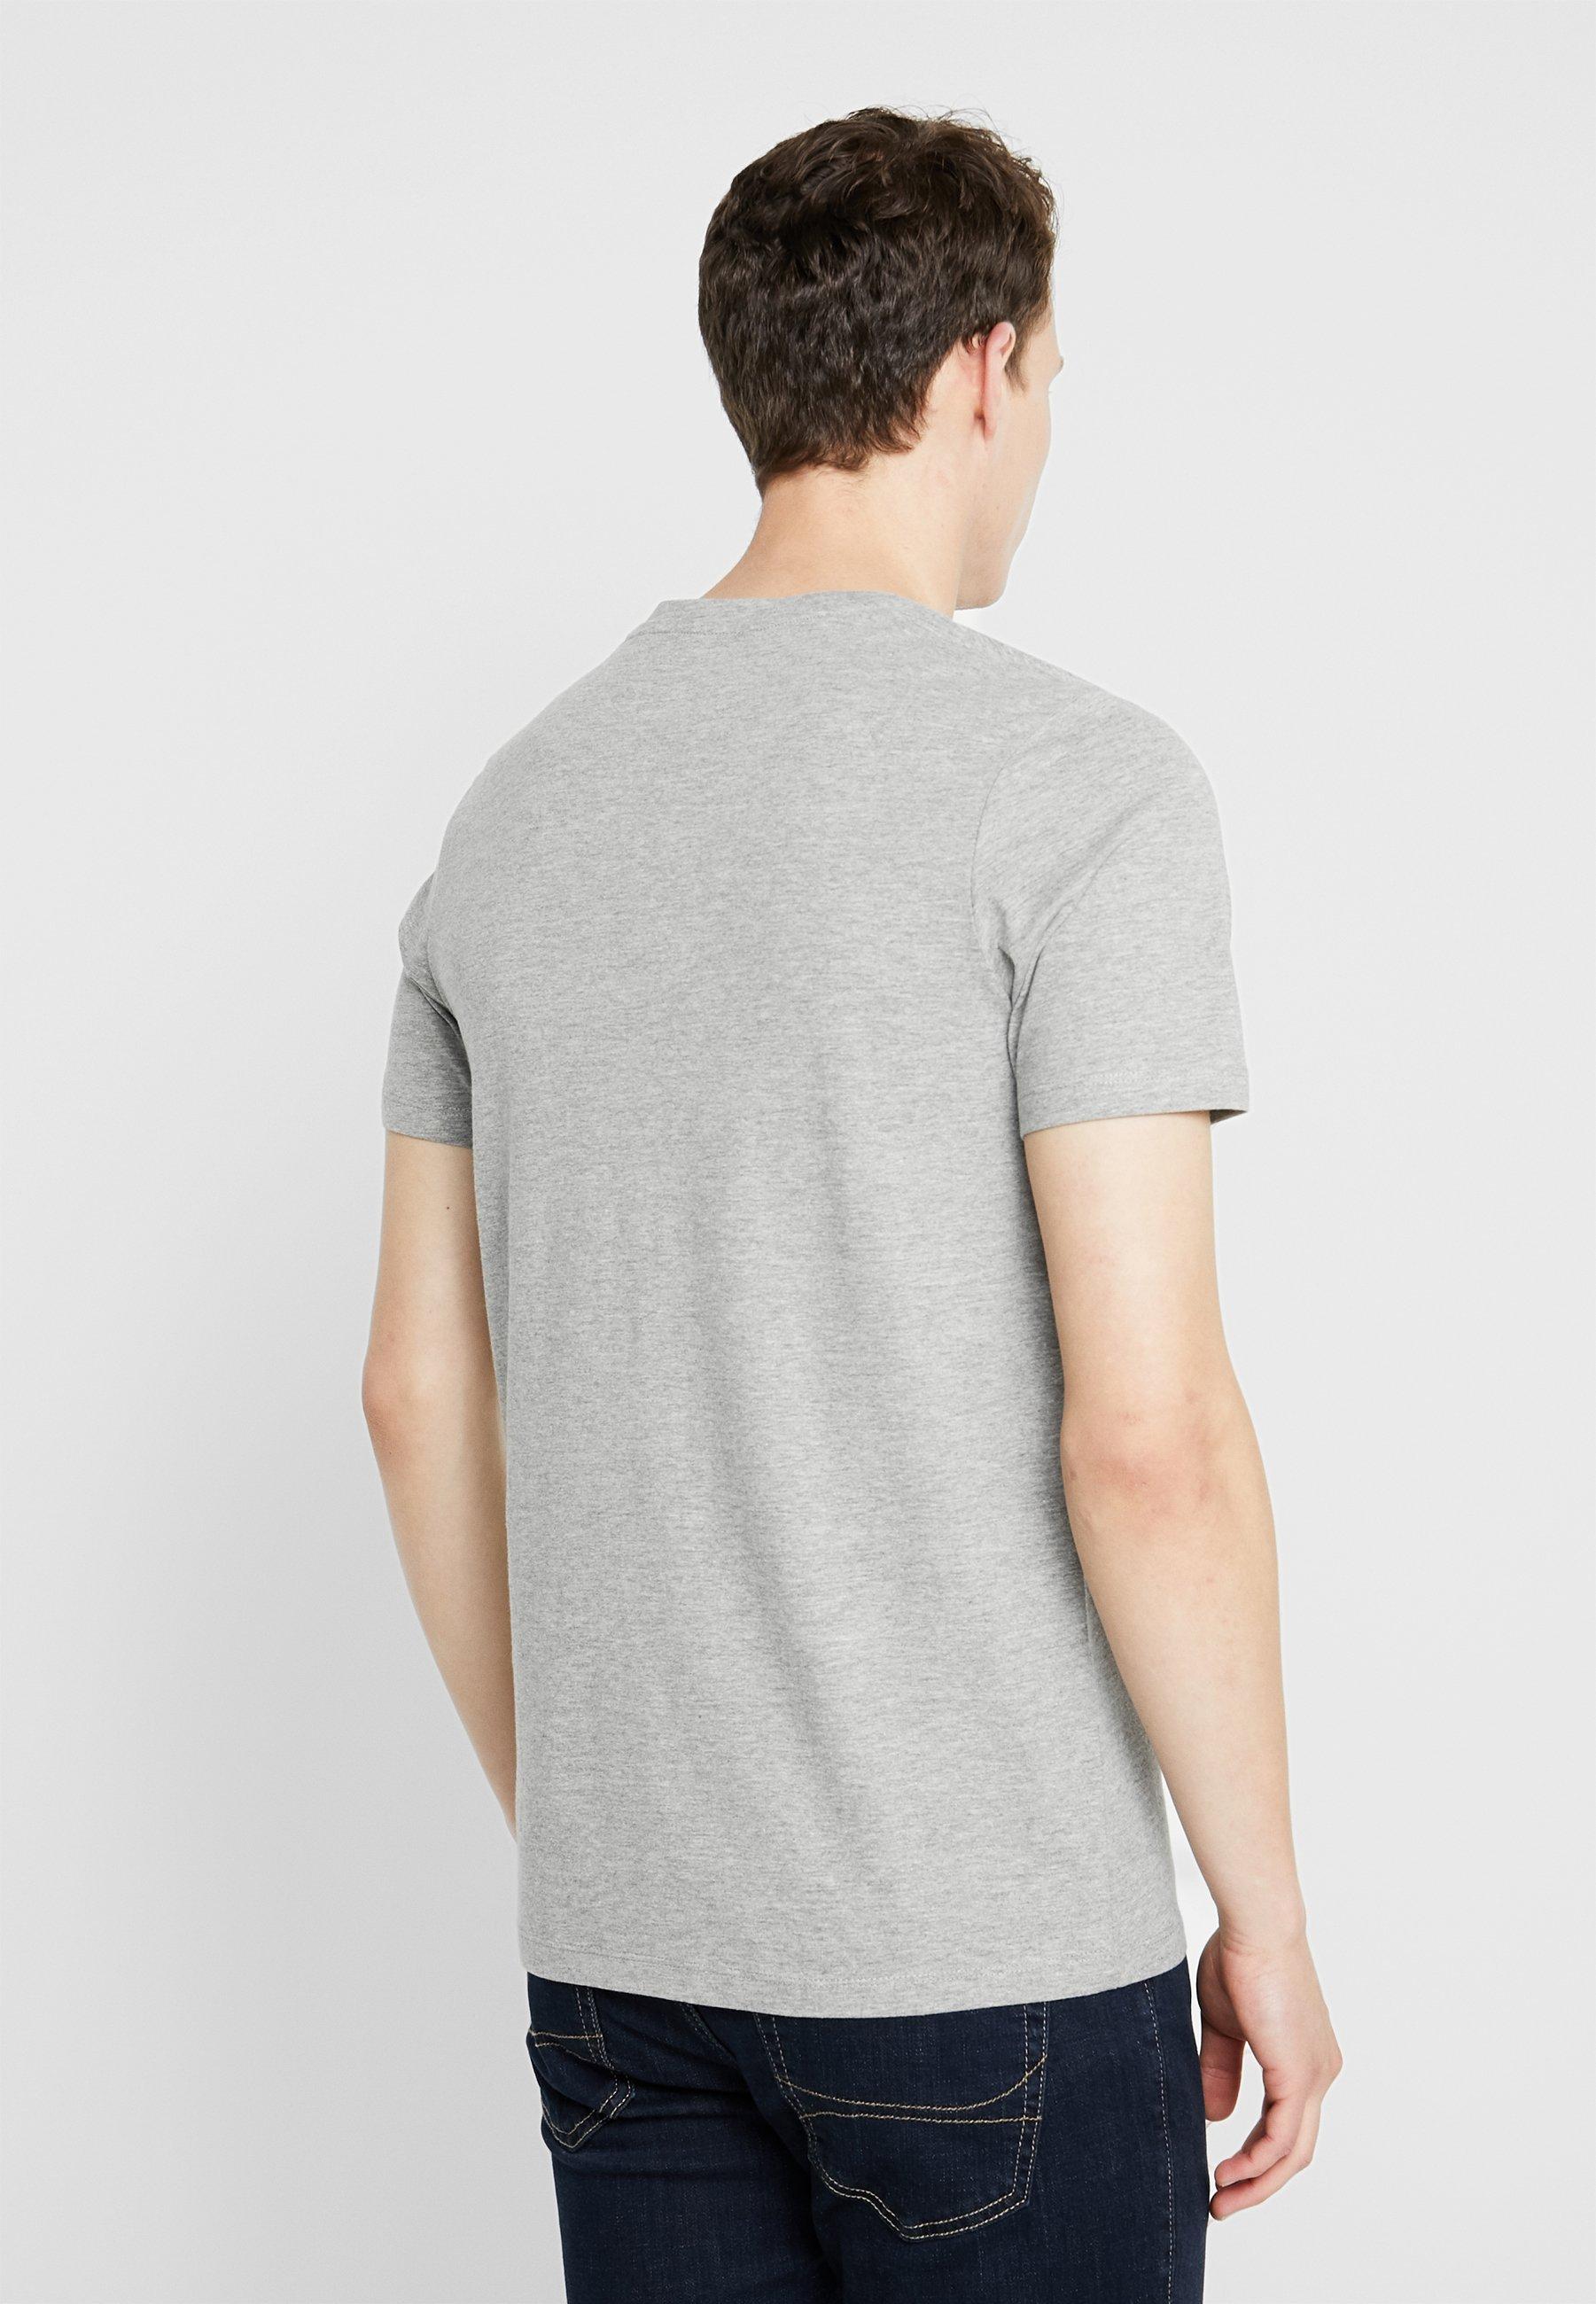 NeckT Melange Crew Imprimé Jones Tee Jortowns Jackamp; Grey shirt Light shrxtQdC